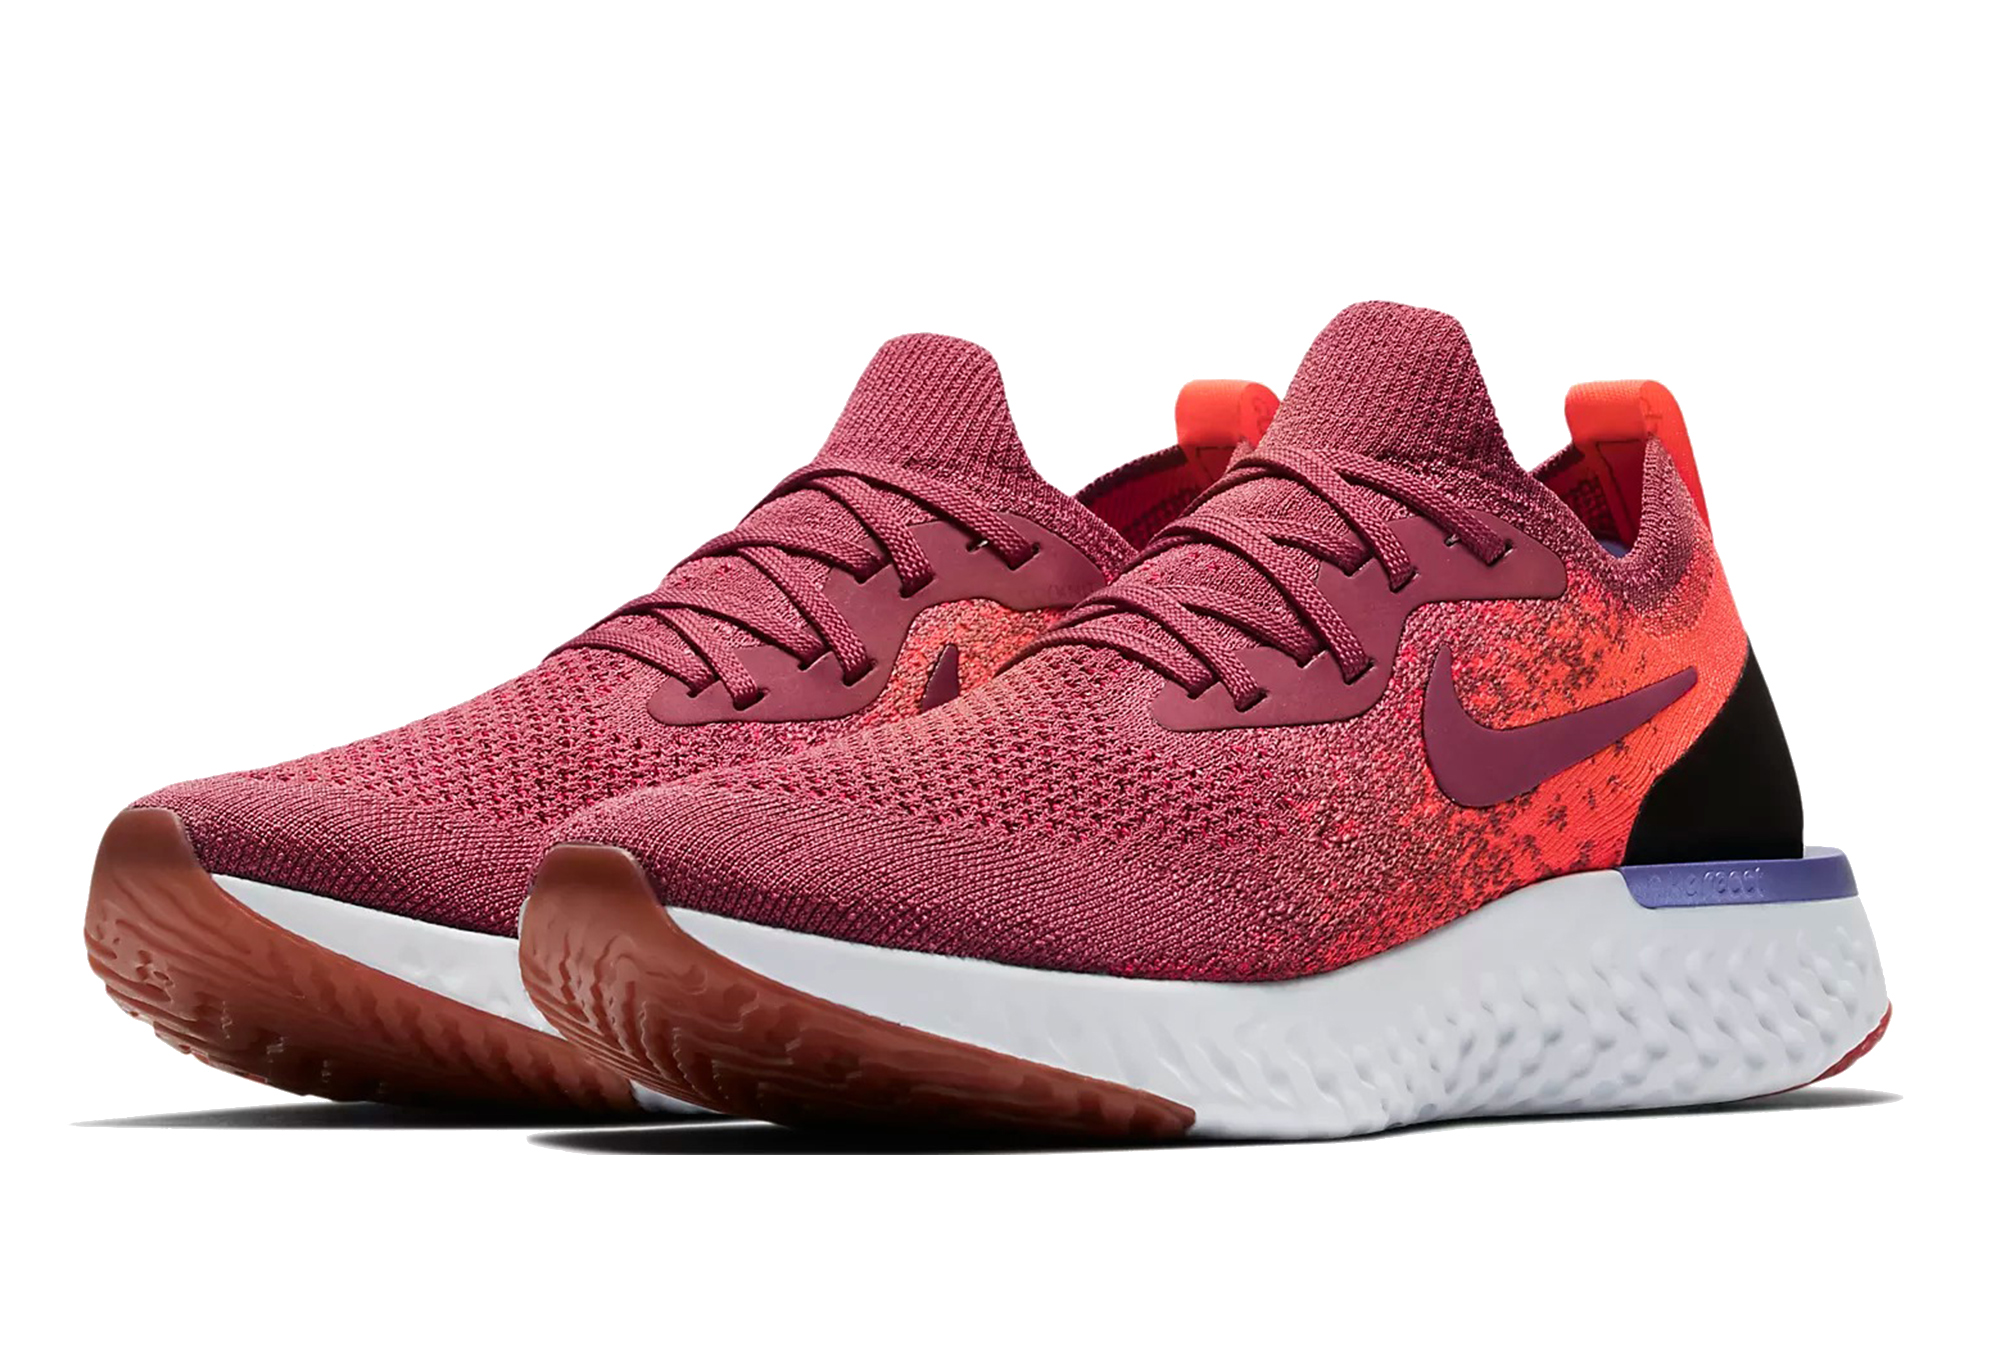 Chaussures de Running Femme Nike Epic React Flyknit Orange / Rose